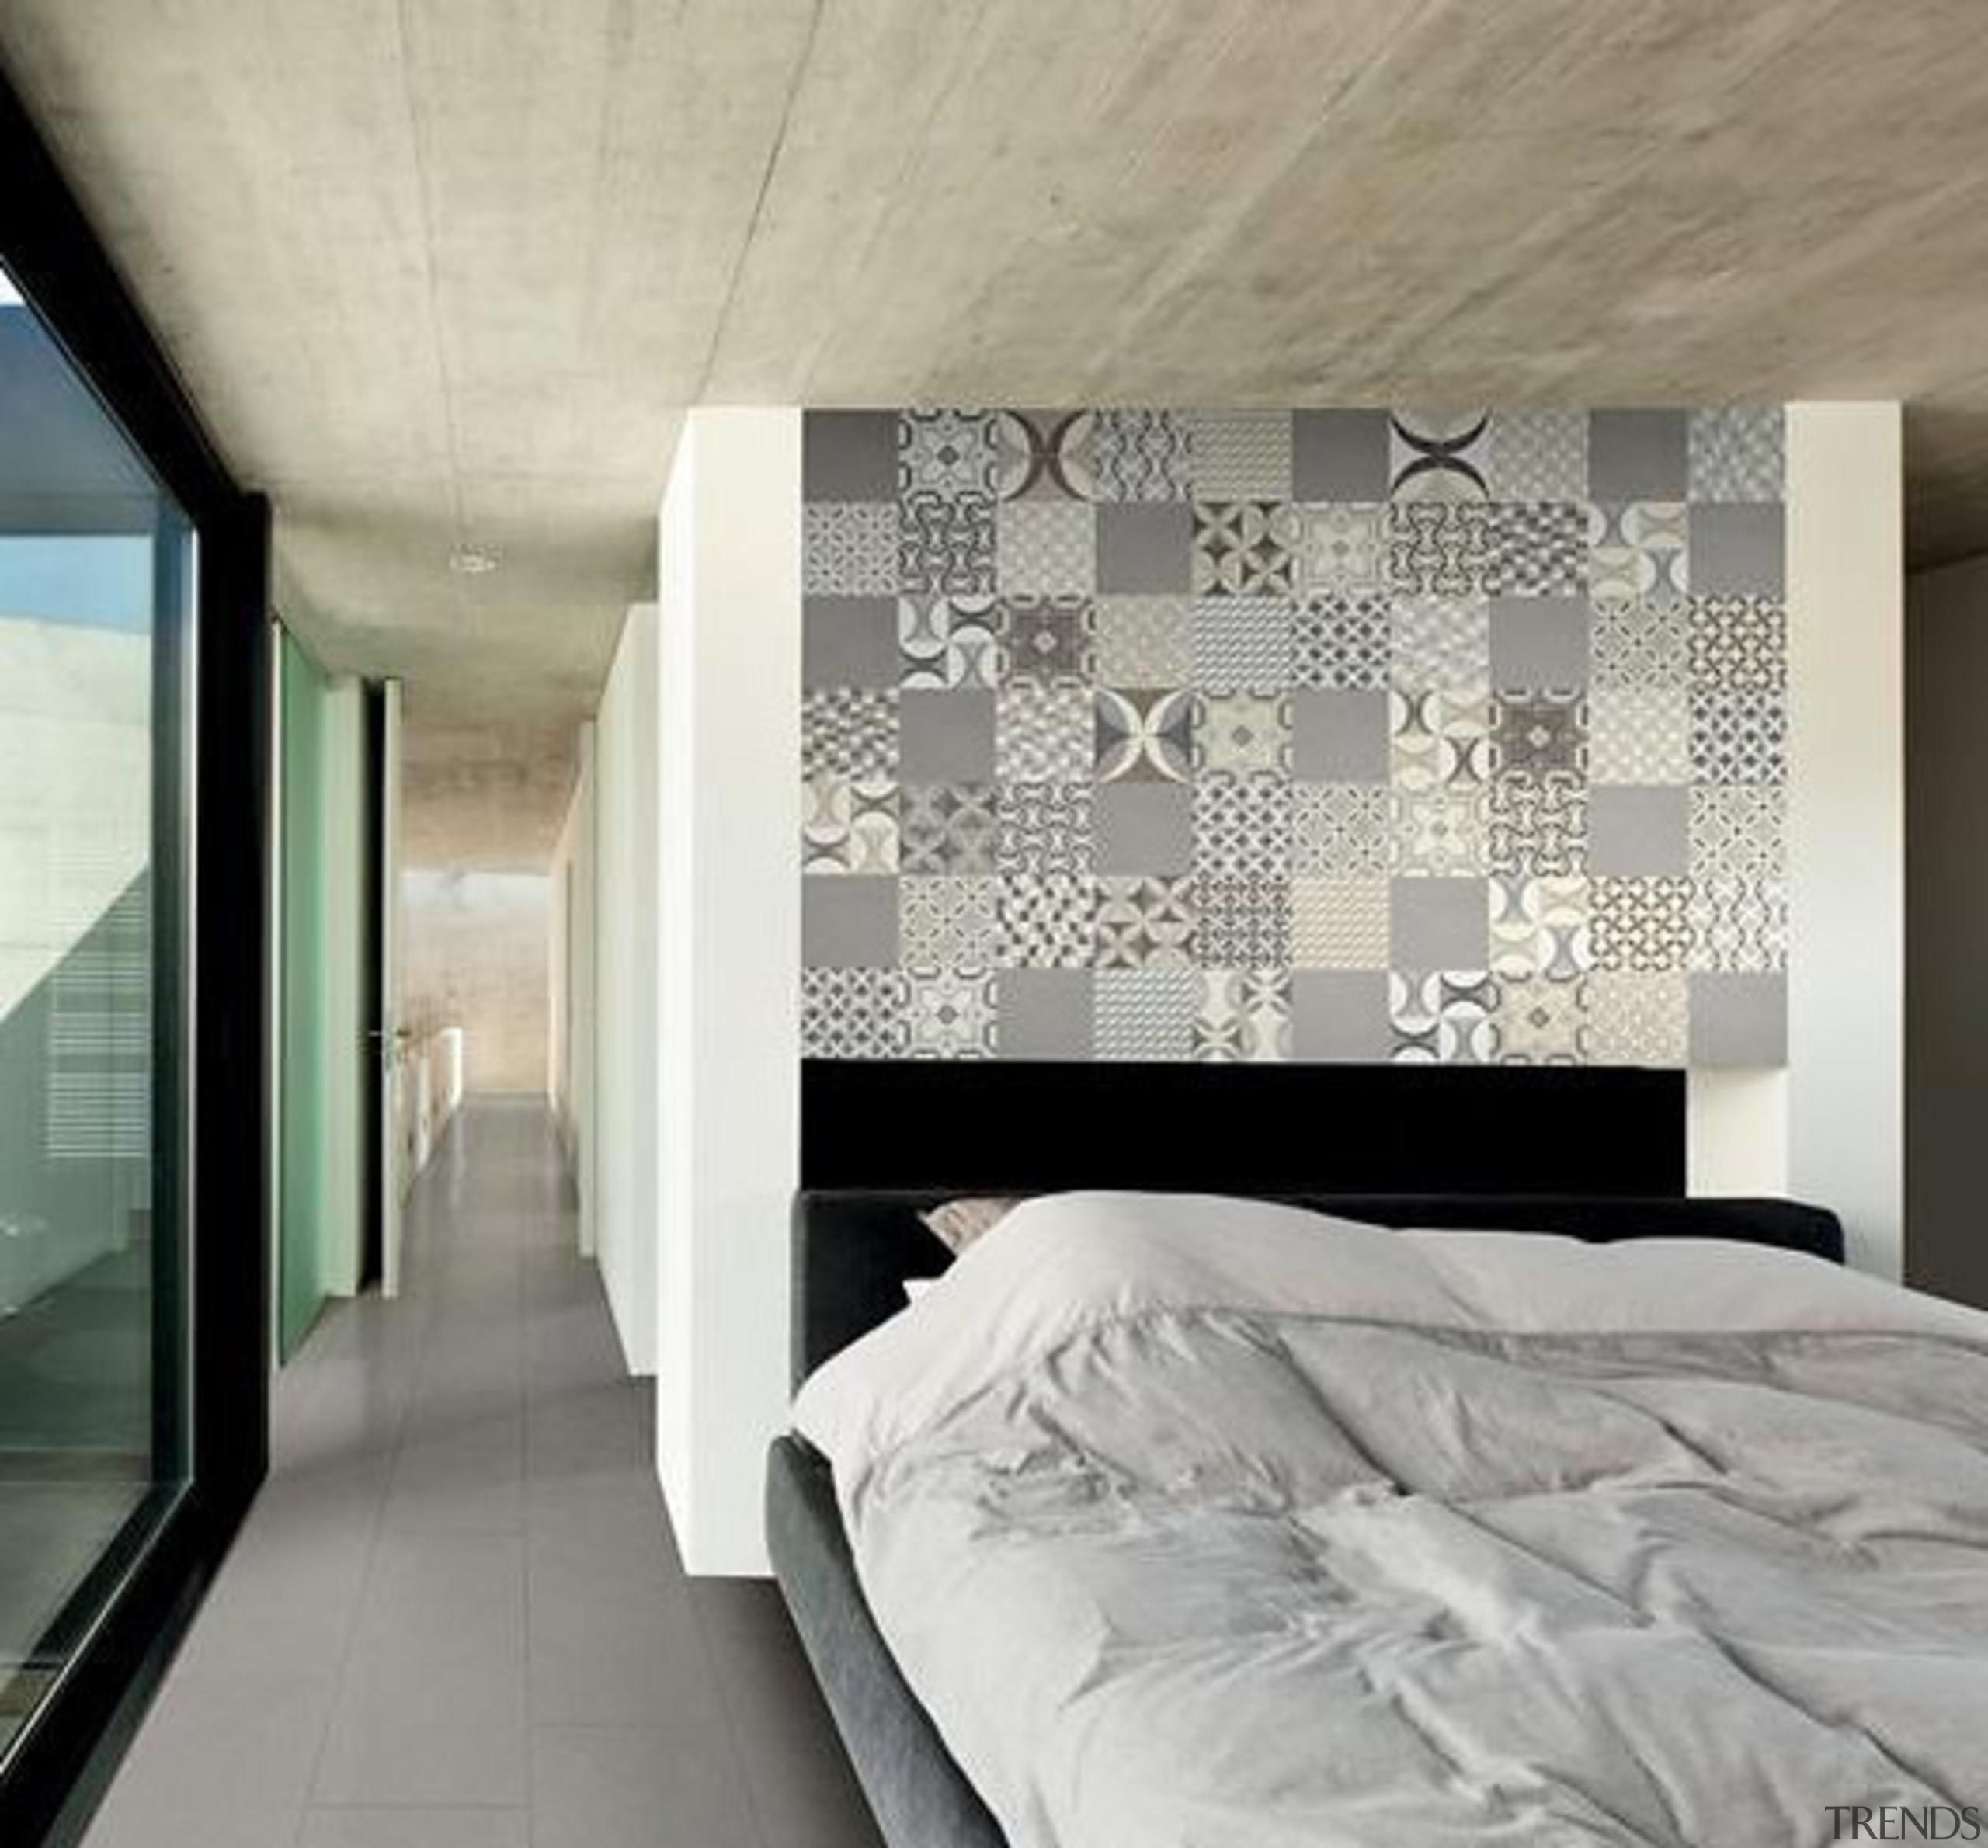 Mix Cementine 200x200 - Mix Cementine 200x200 - architecture, bed frame, ceiling, floor, interior design, wall, window, gray